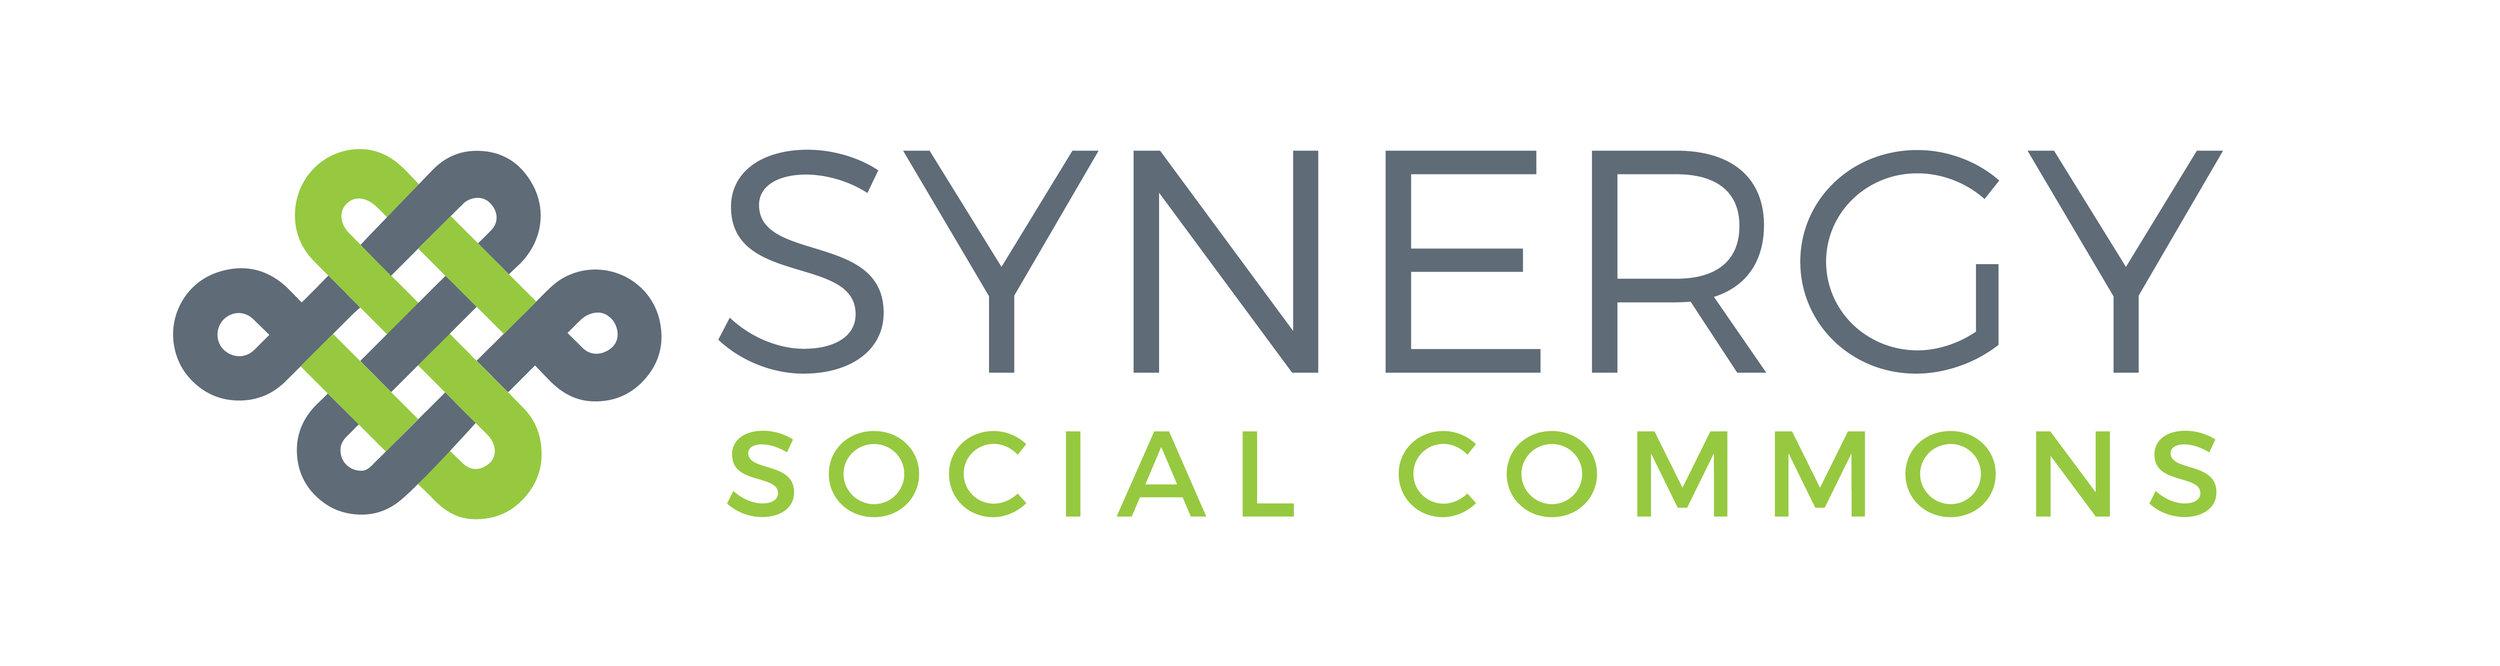 Synergy Logo Glyph.jpg